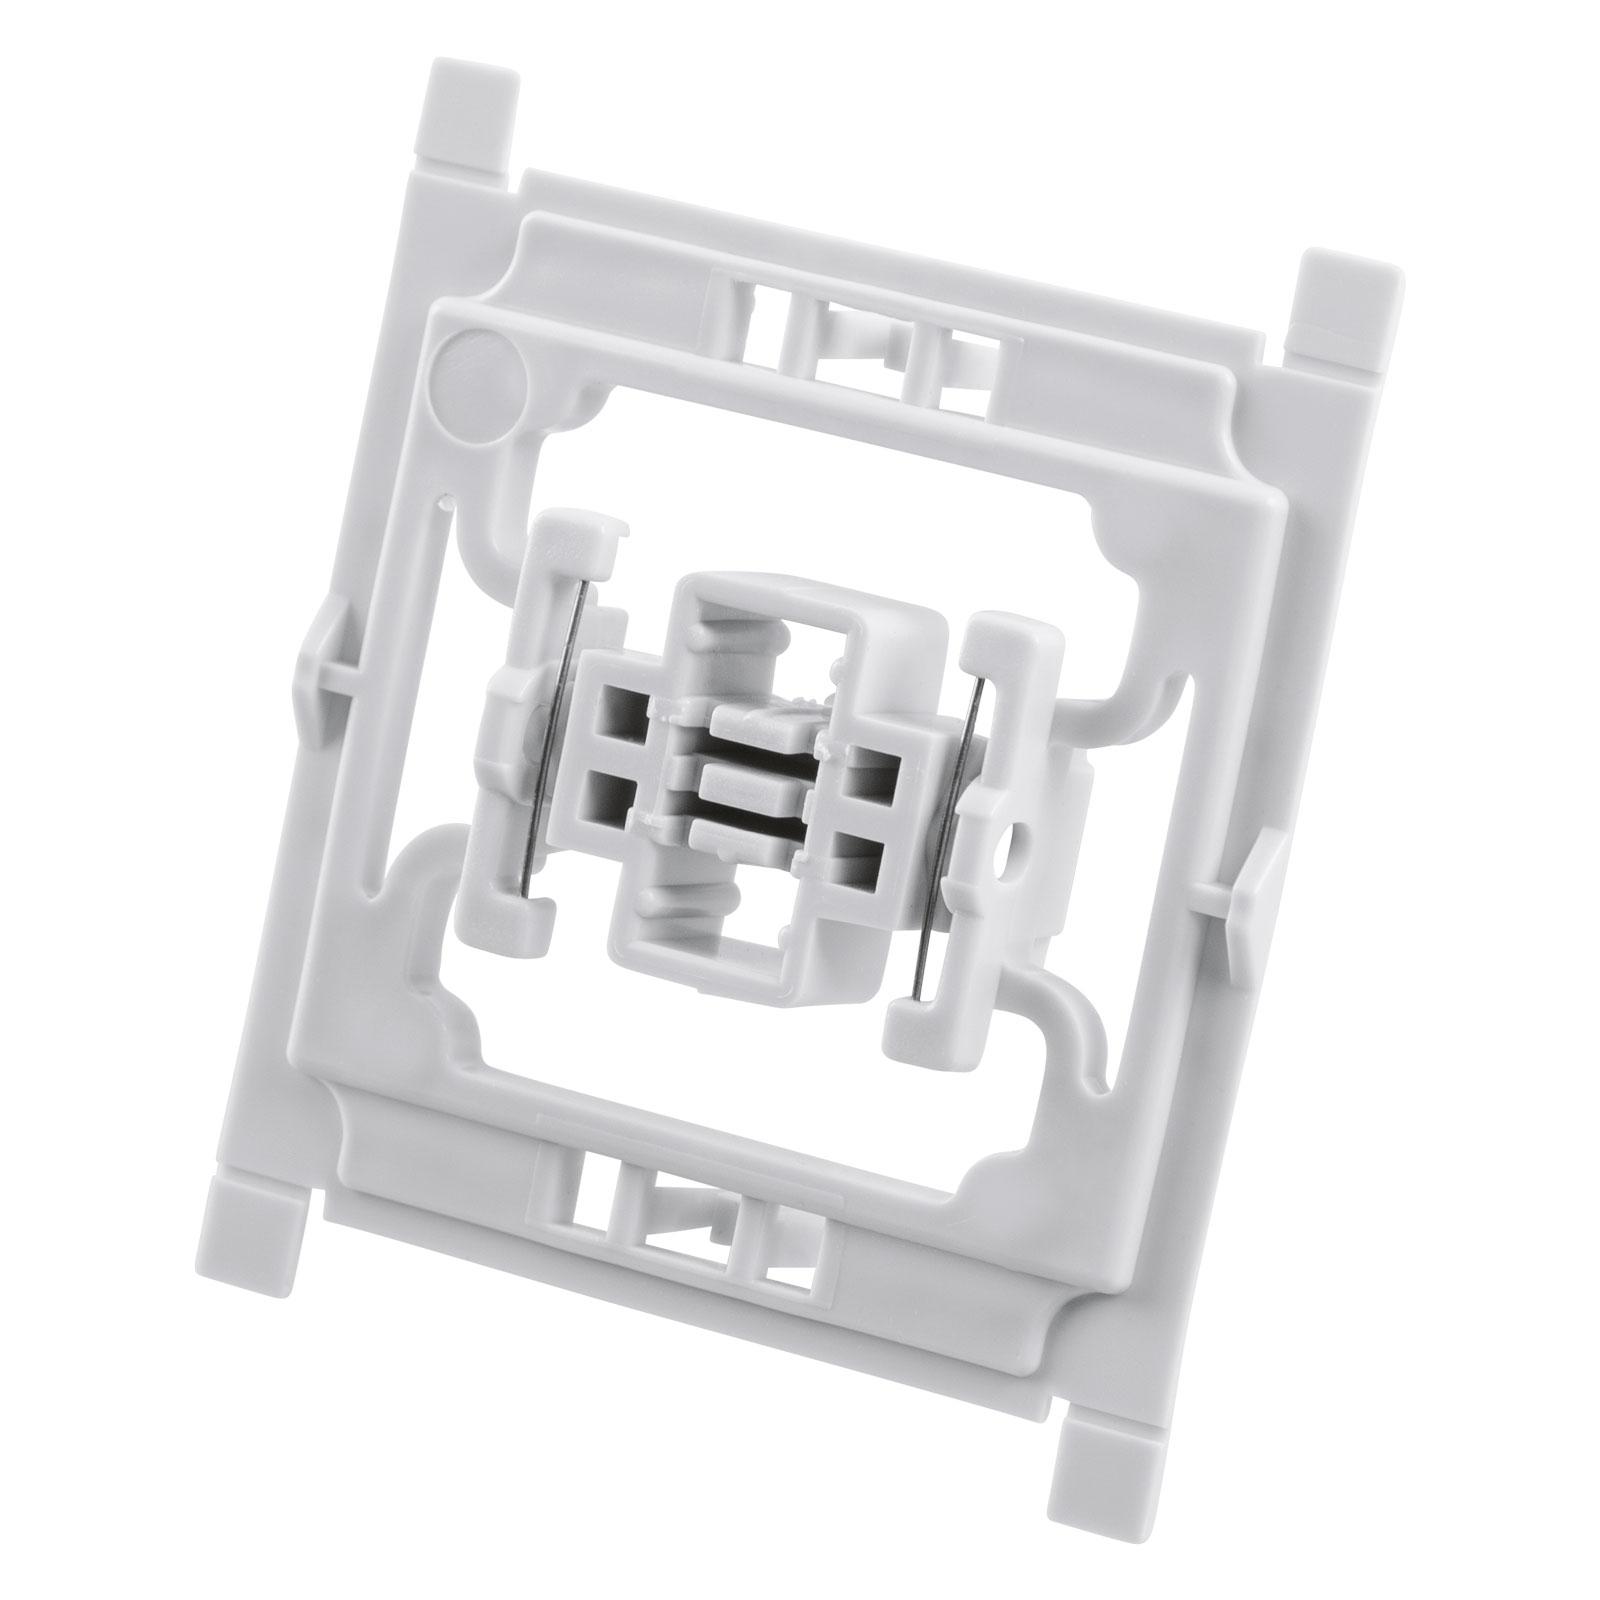 Homematic IP adaptateur Siemens DELTA 20x